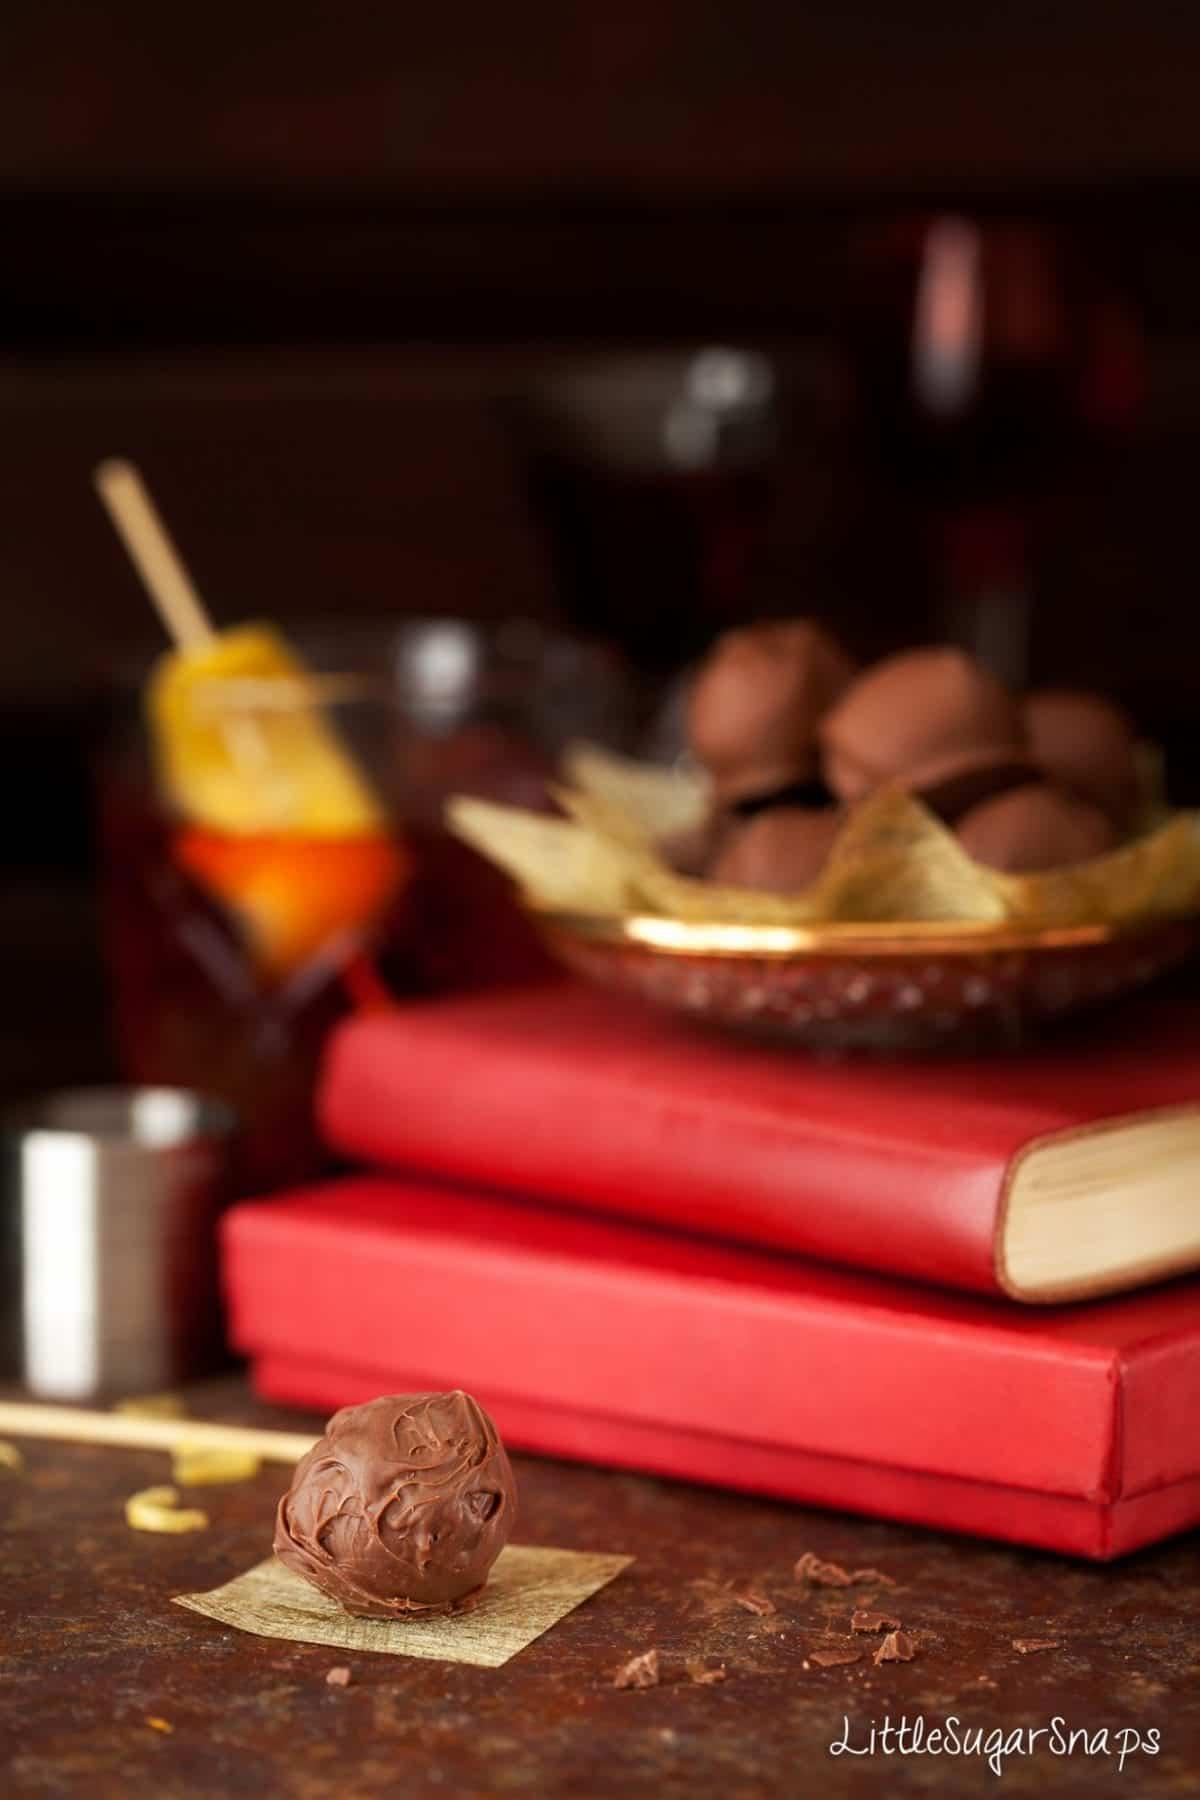 Negroni Truffles #negroni #chocolatetruffle #truffles #negronitruffle